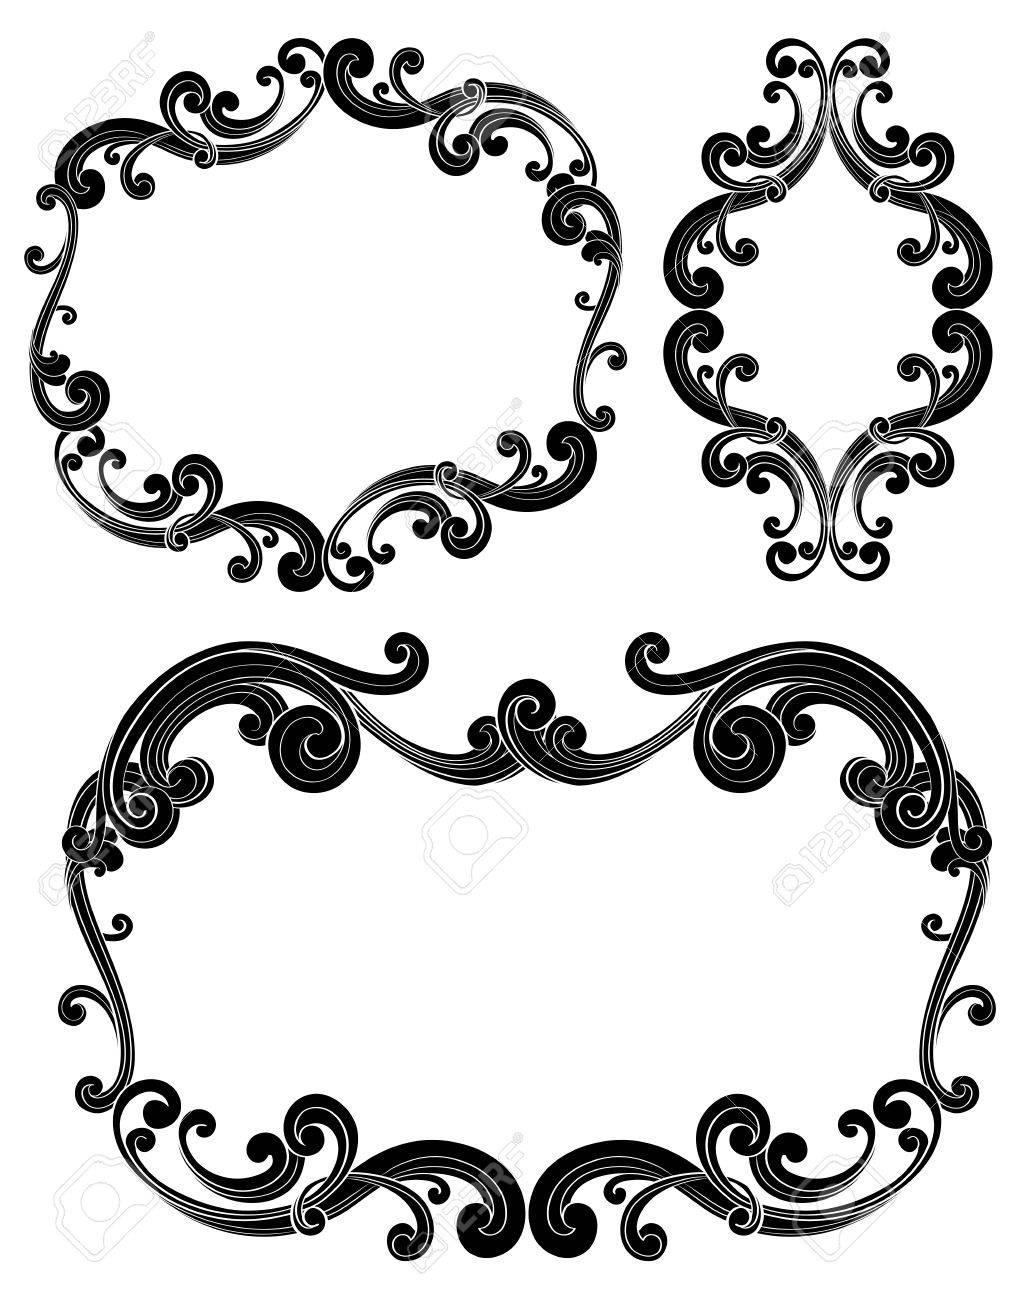 Ornate Scroll Frames - Set Of Three Isolated Black Scroll Frames ...